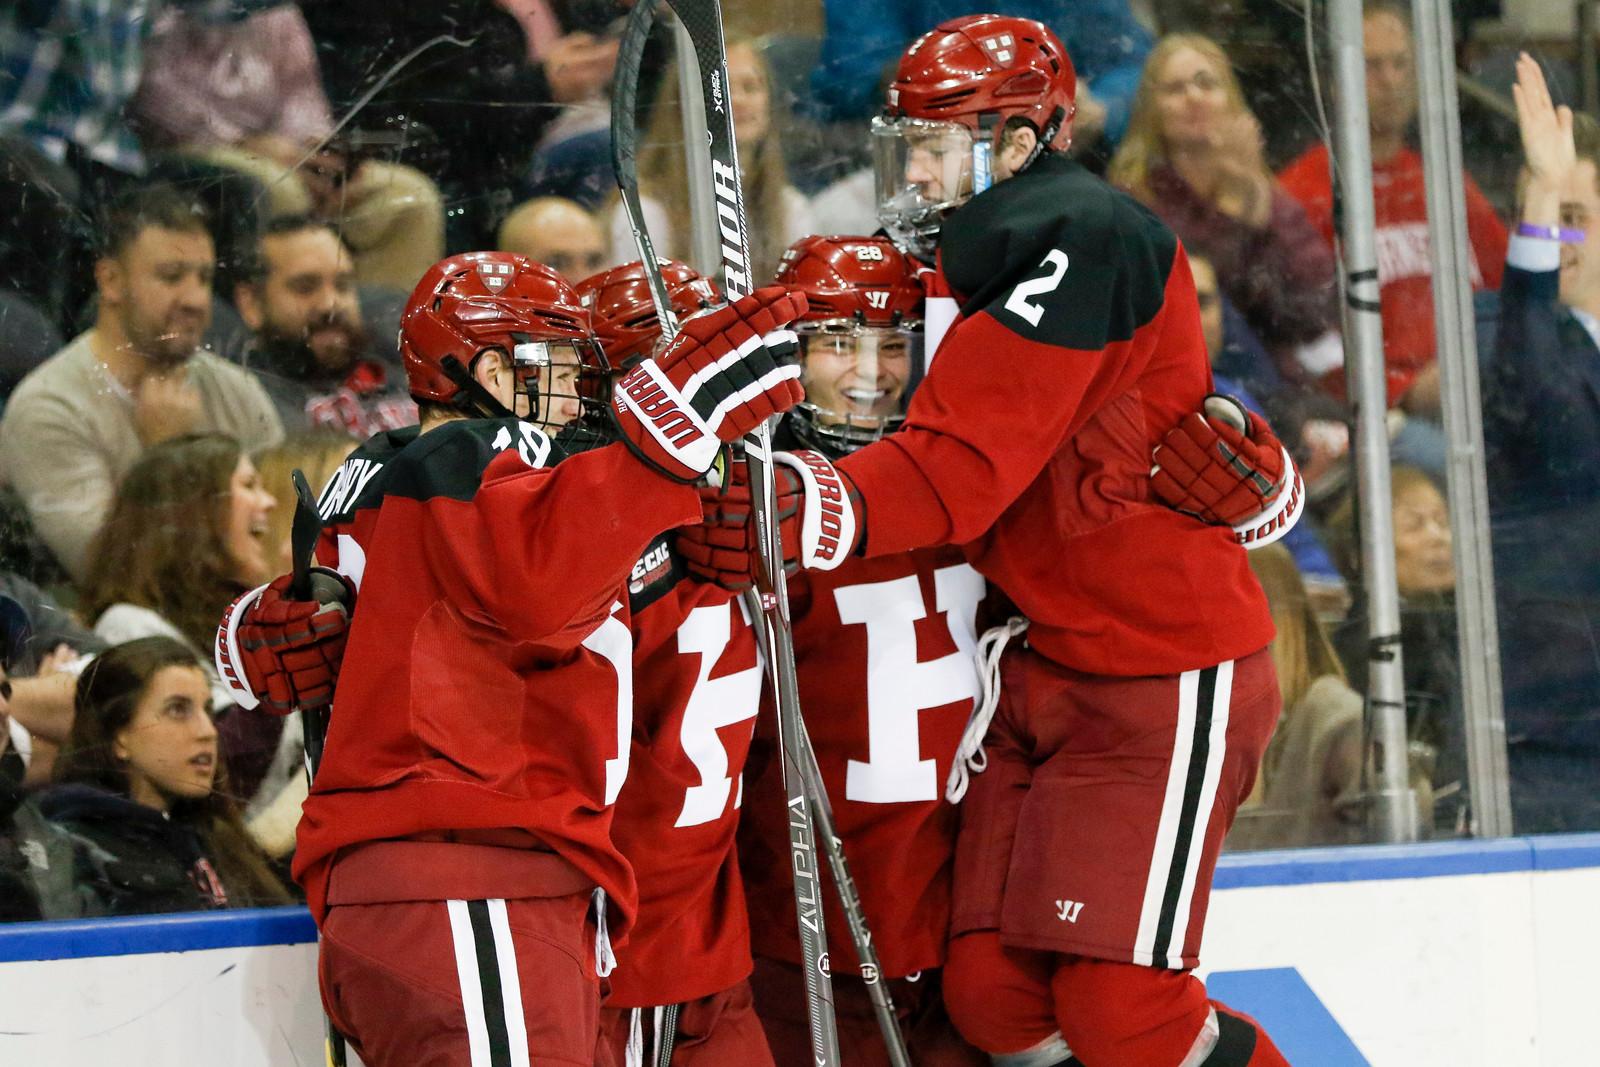 Last season, Harvard defeated Cornell at Madison Square Garden in a pivotal game in the 2018-2019 season narrative.